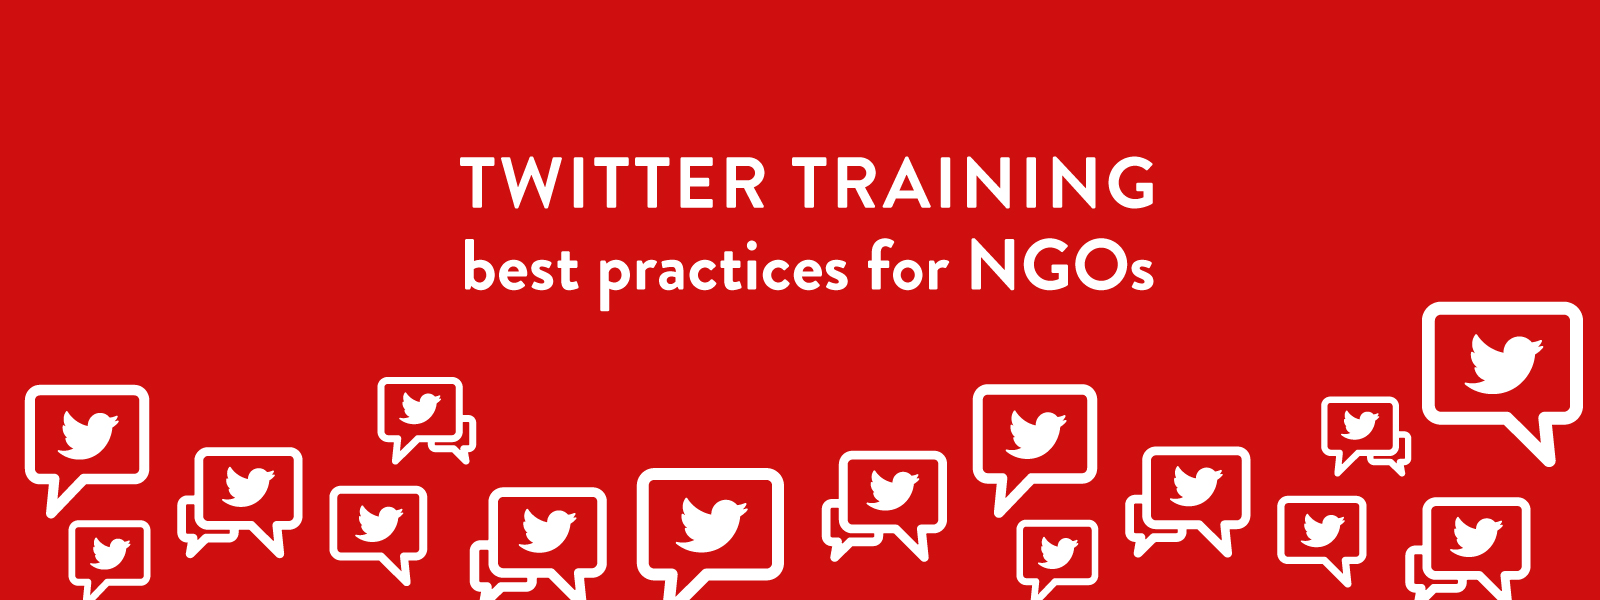 twitter training session for ngo